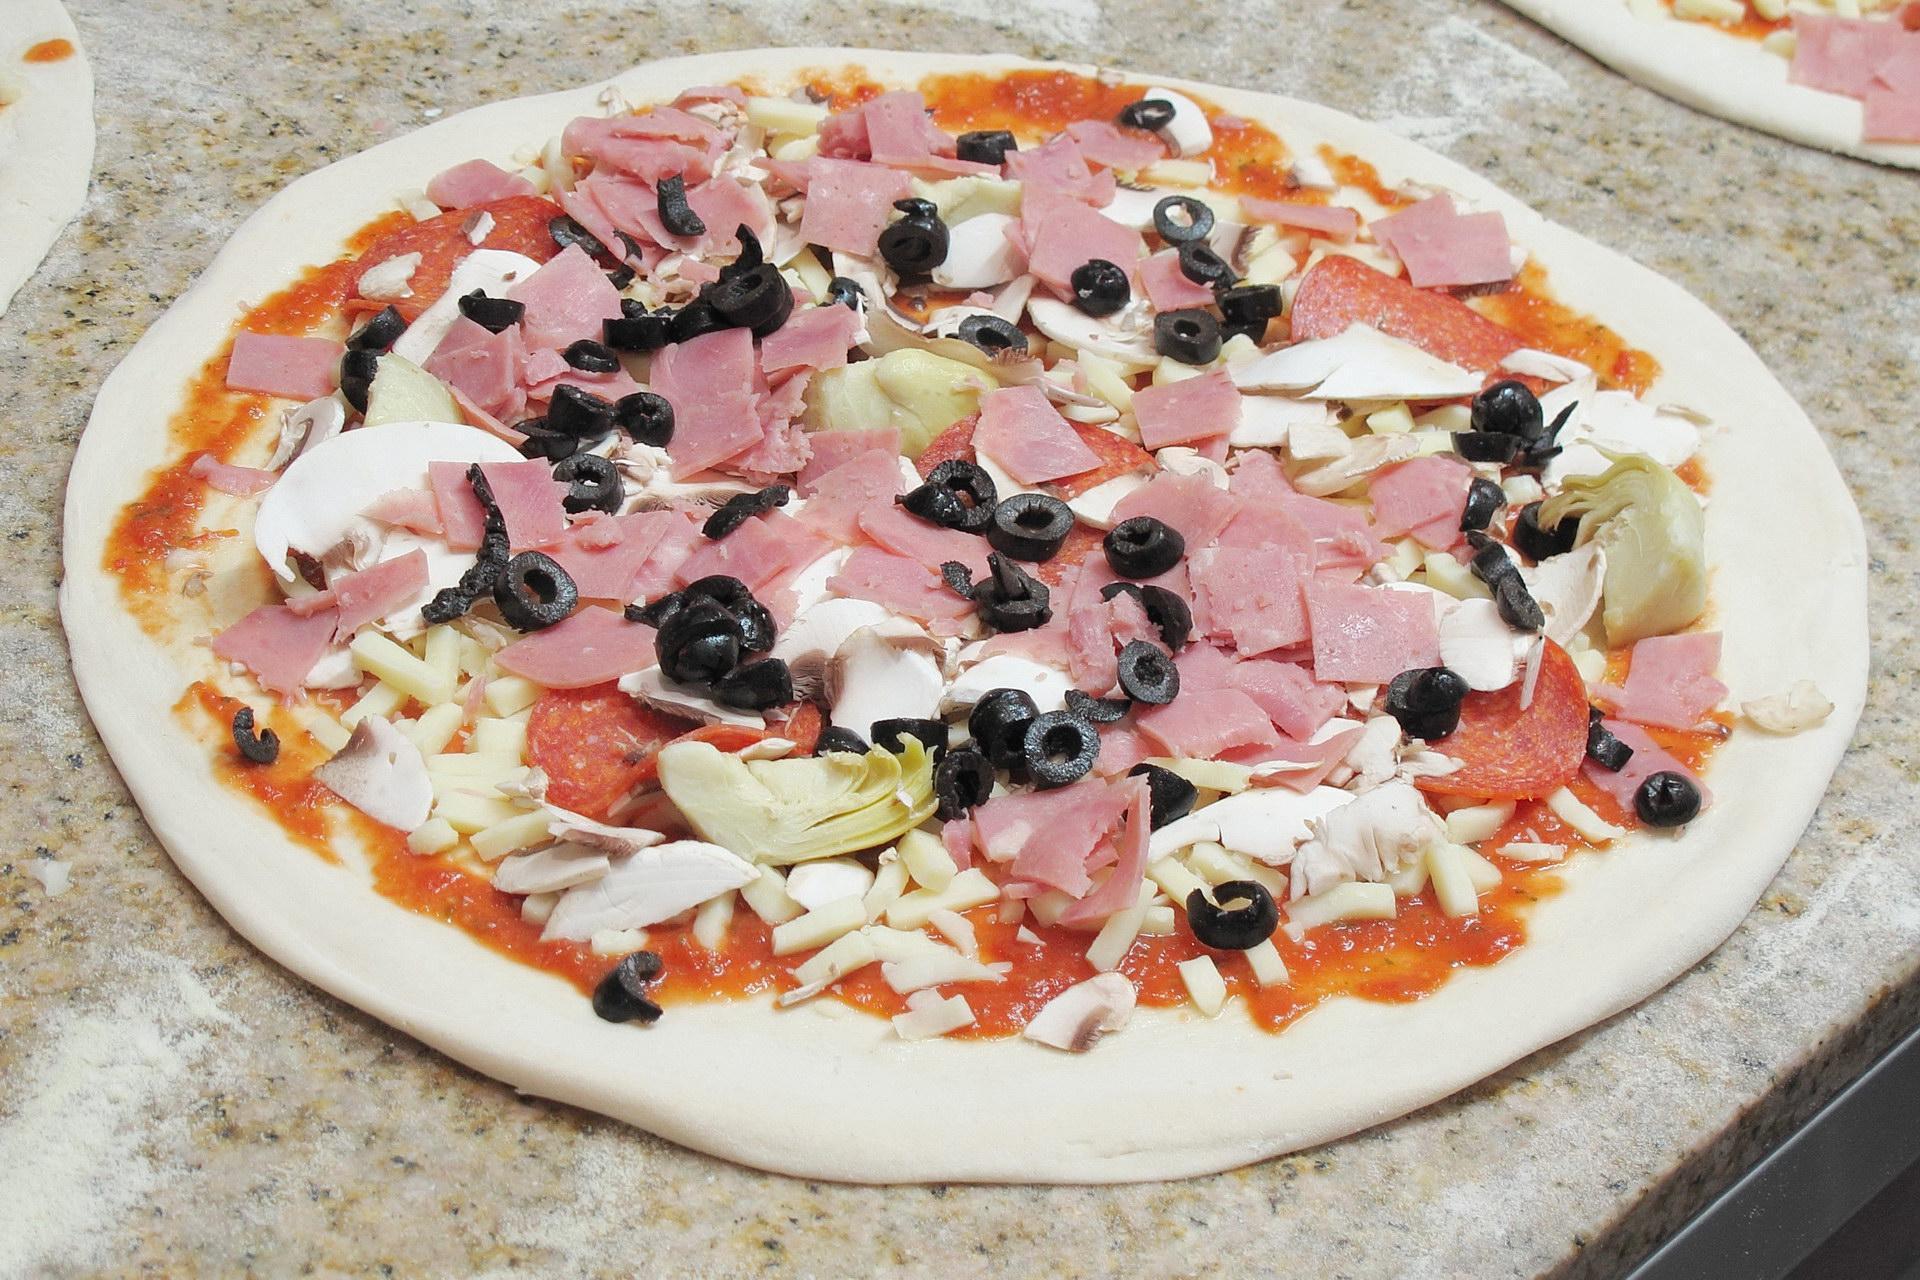 Le-Mediterraneen-Pizza-Braine-l-Alleud-0017.jpg